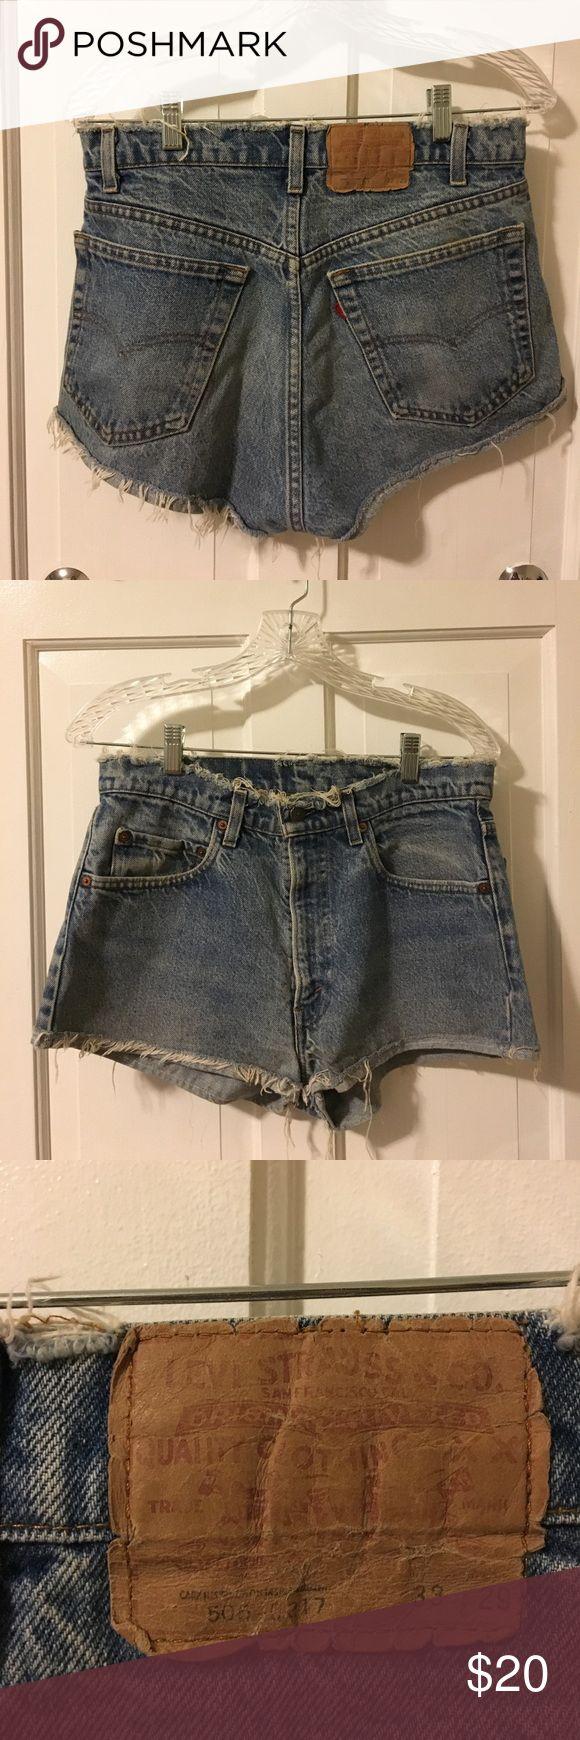 Levi cutoff jean shorts Light wash cutoff Levi jean shorts size 29, lightly worn Levi's Shorts Jean Shorts